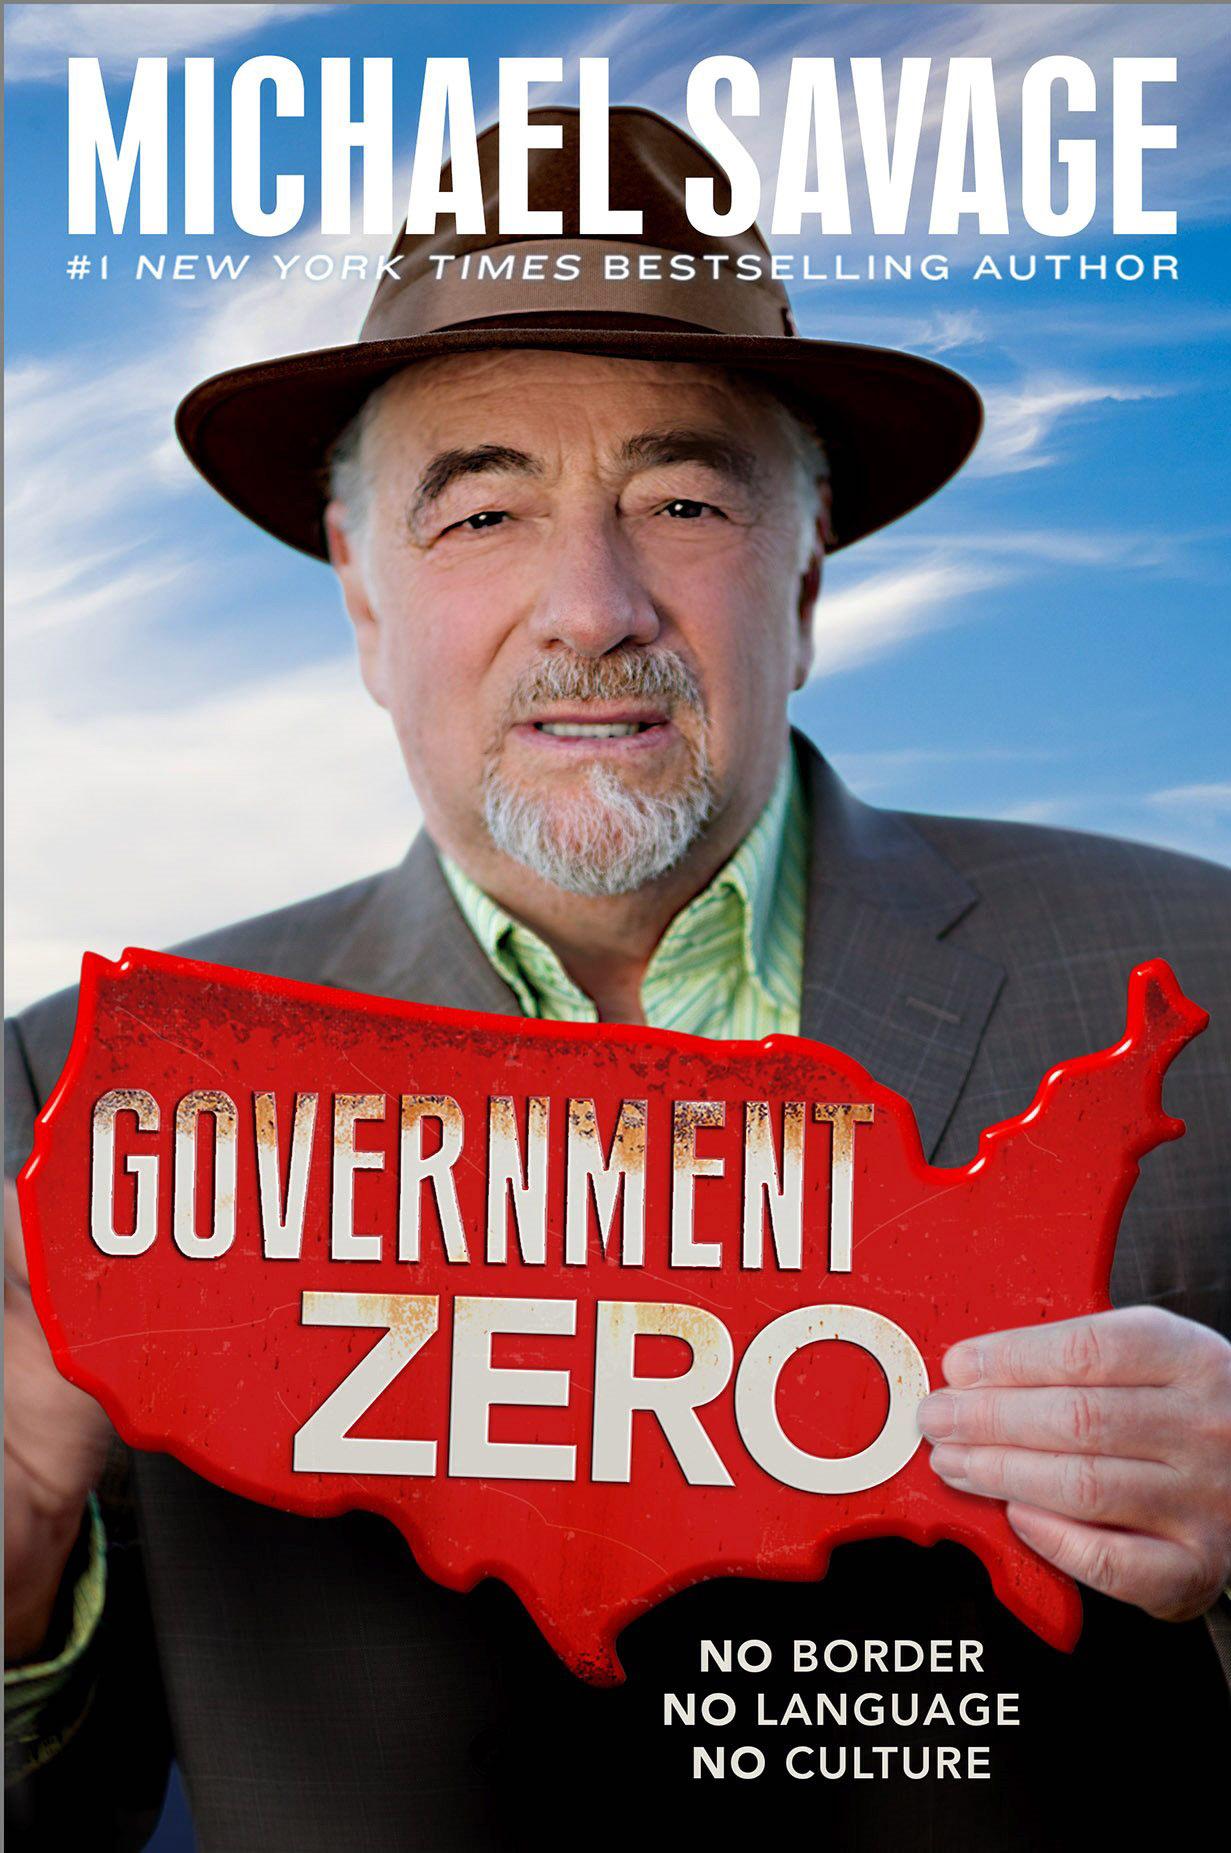 Savage Governmentze